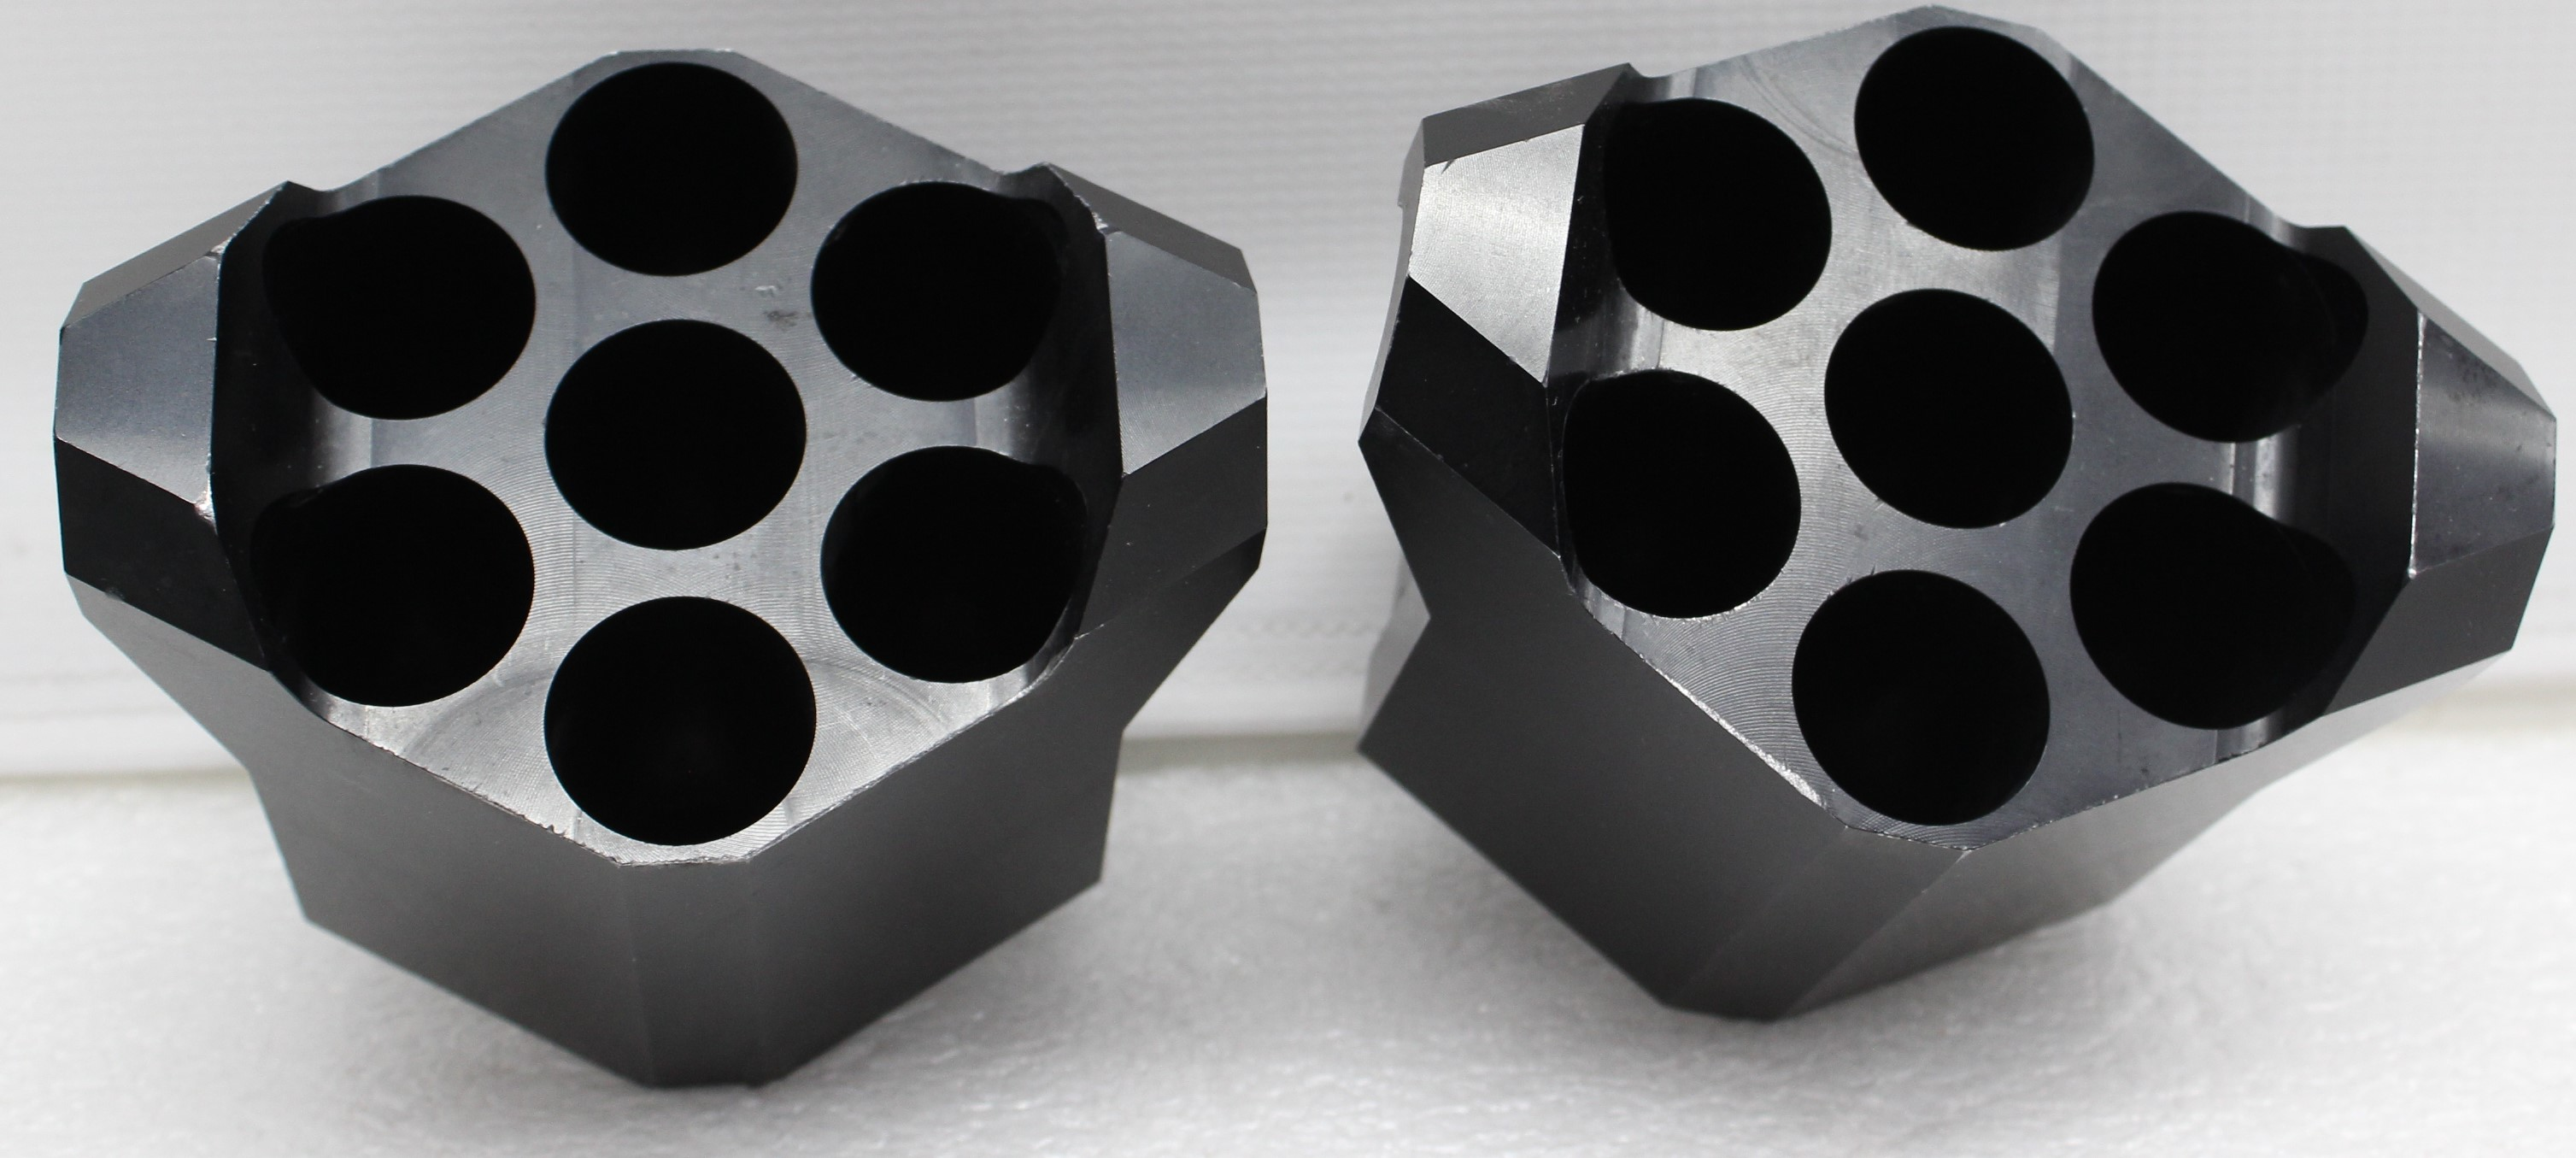 Image SORVALL HERAEUS 75002024 K Centrifuge Buckets - 7-Place, 600g, 4600rpm 1587207